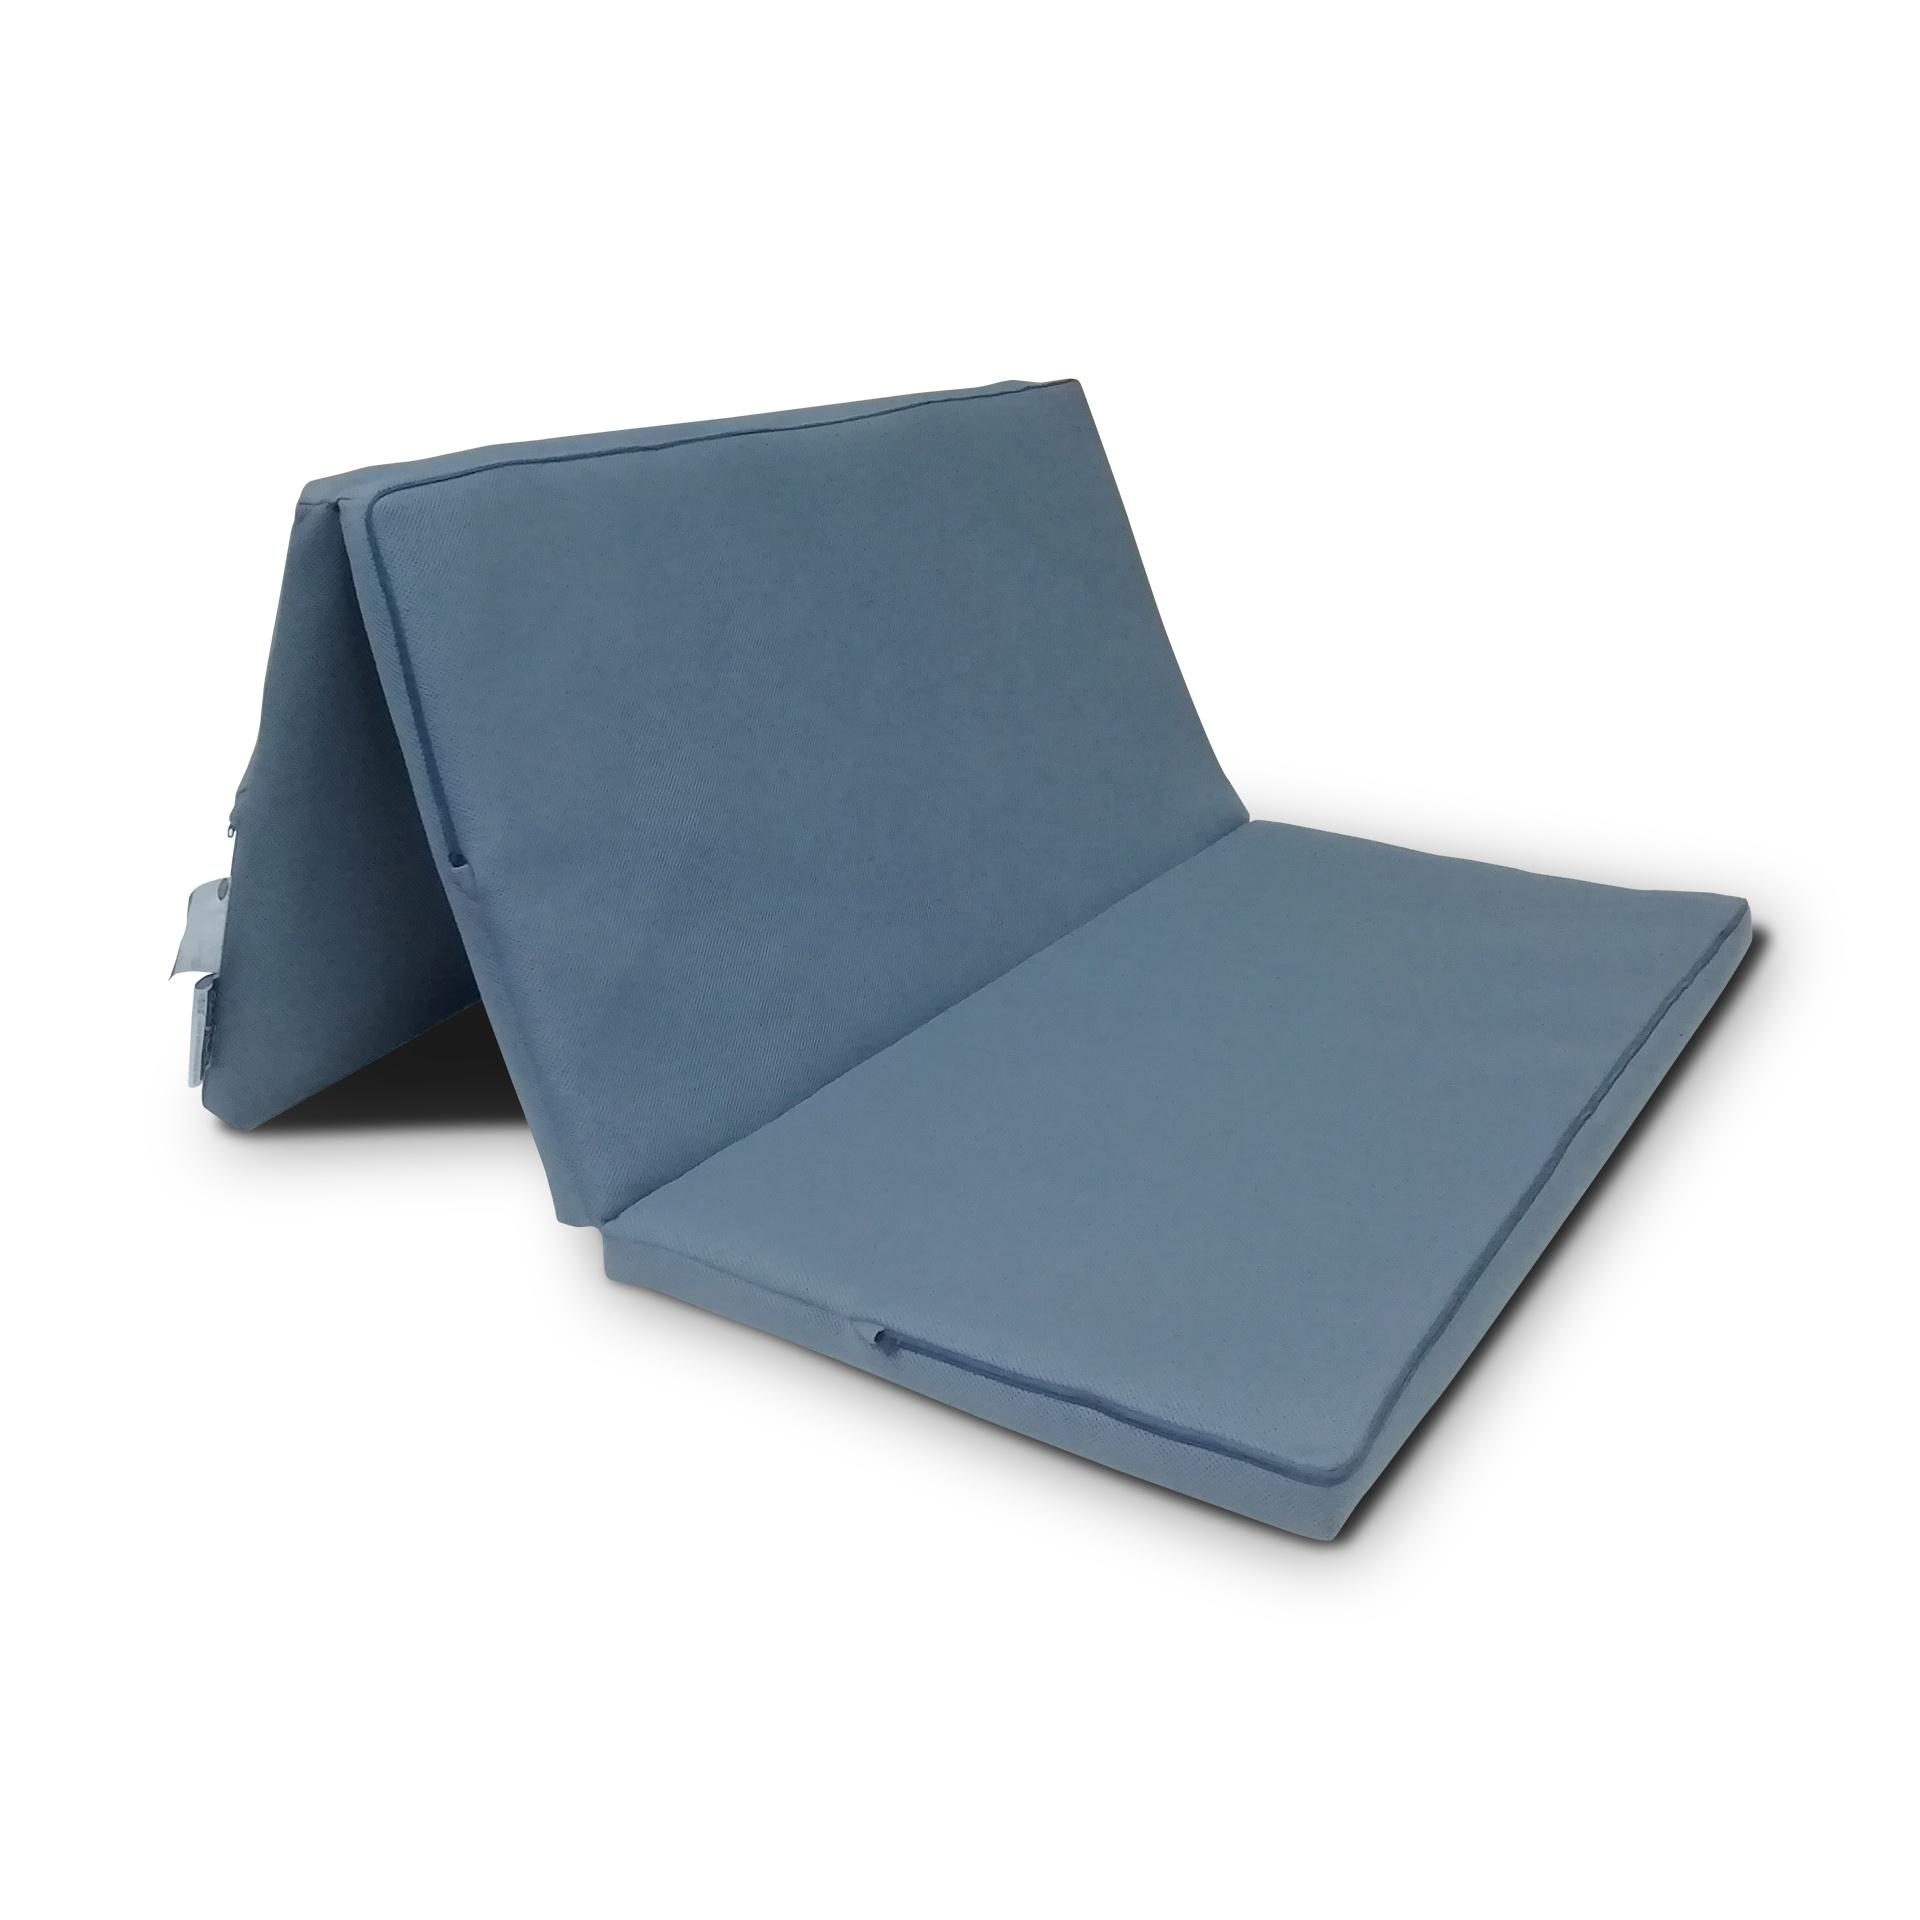 Skylee 3 Folding Portable Mattress 3 fold thin mattress Seating Sofa - Jozy Mattress   Jozy.net